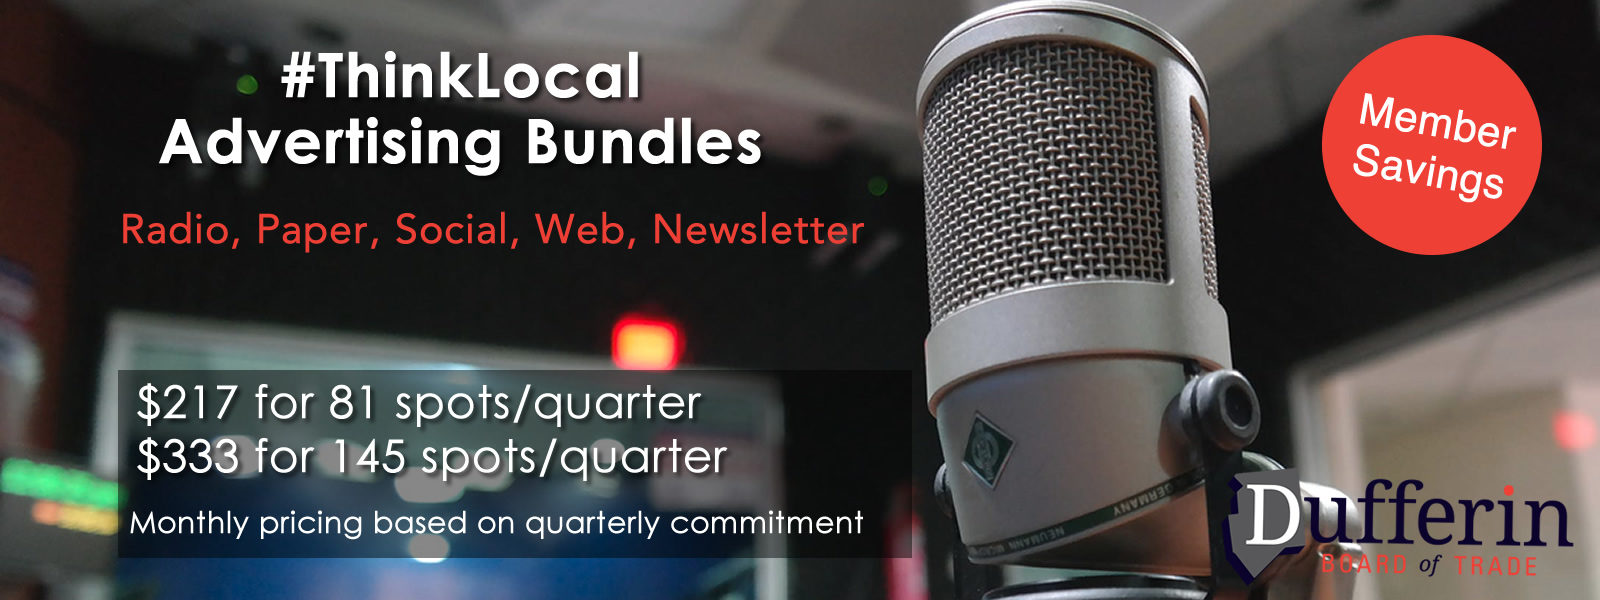 Think local advertising bundles